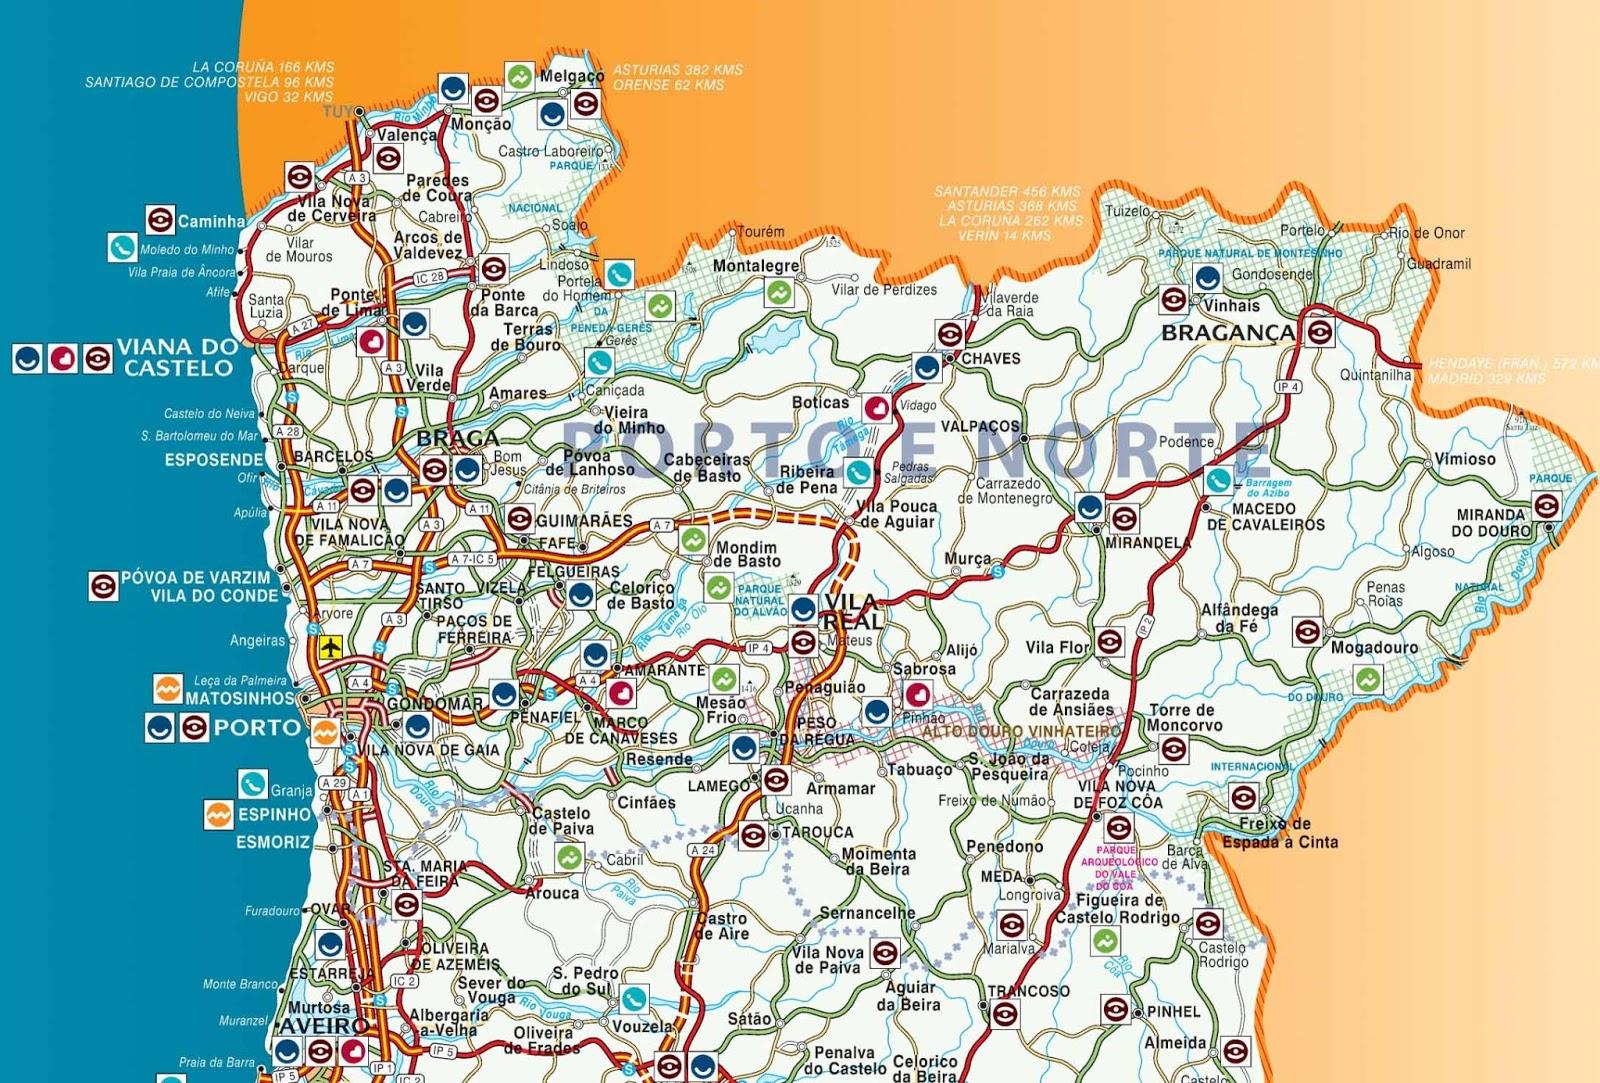 mapa aeroportos espanha Mapas de Braga   Portugal | MapasBlog mapa aeroportos espanha